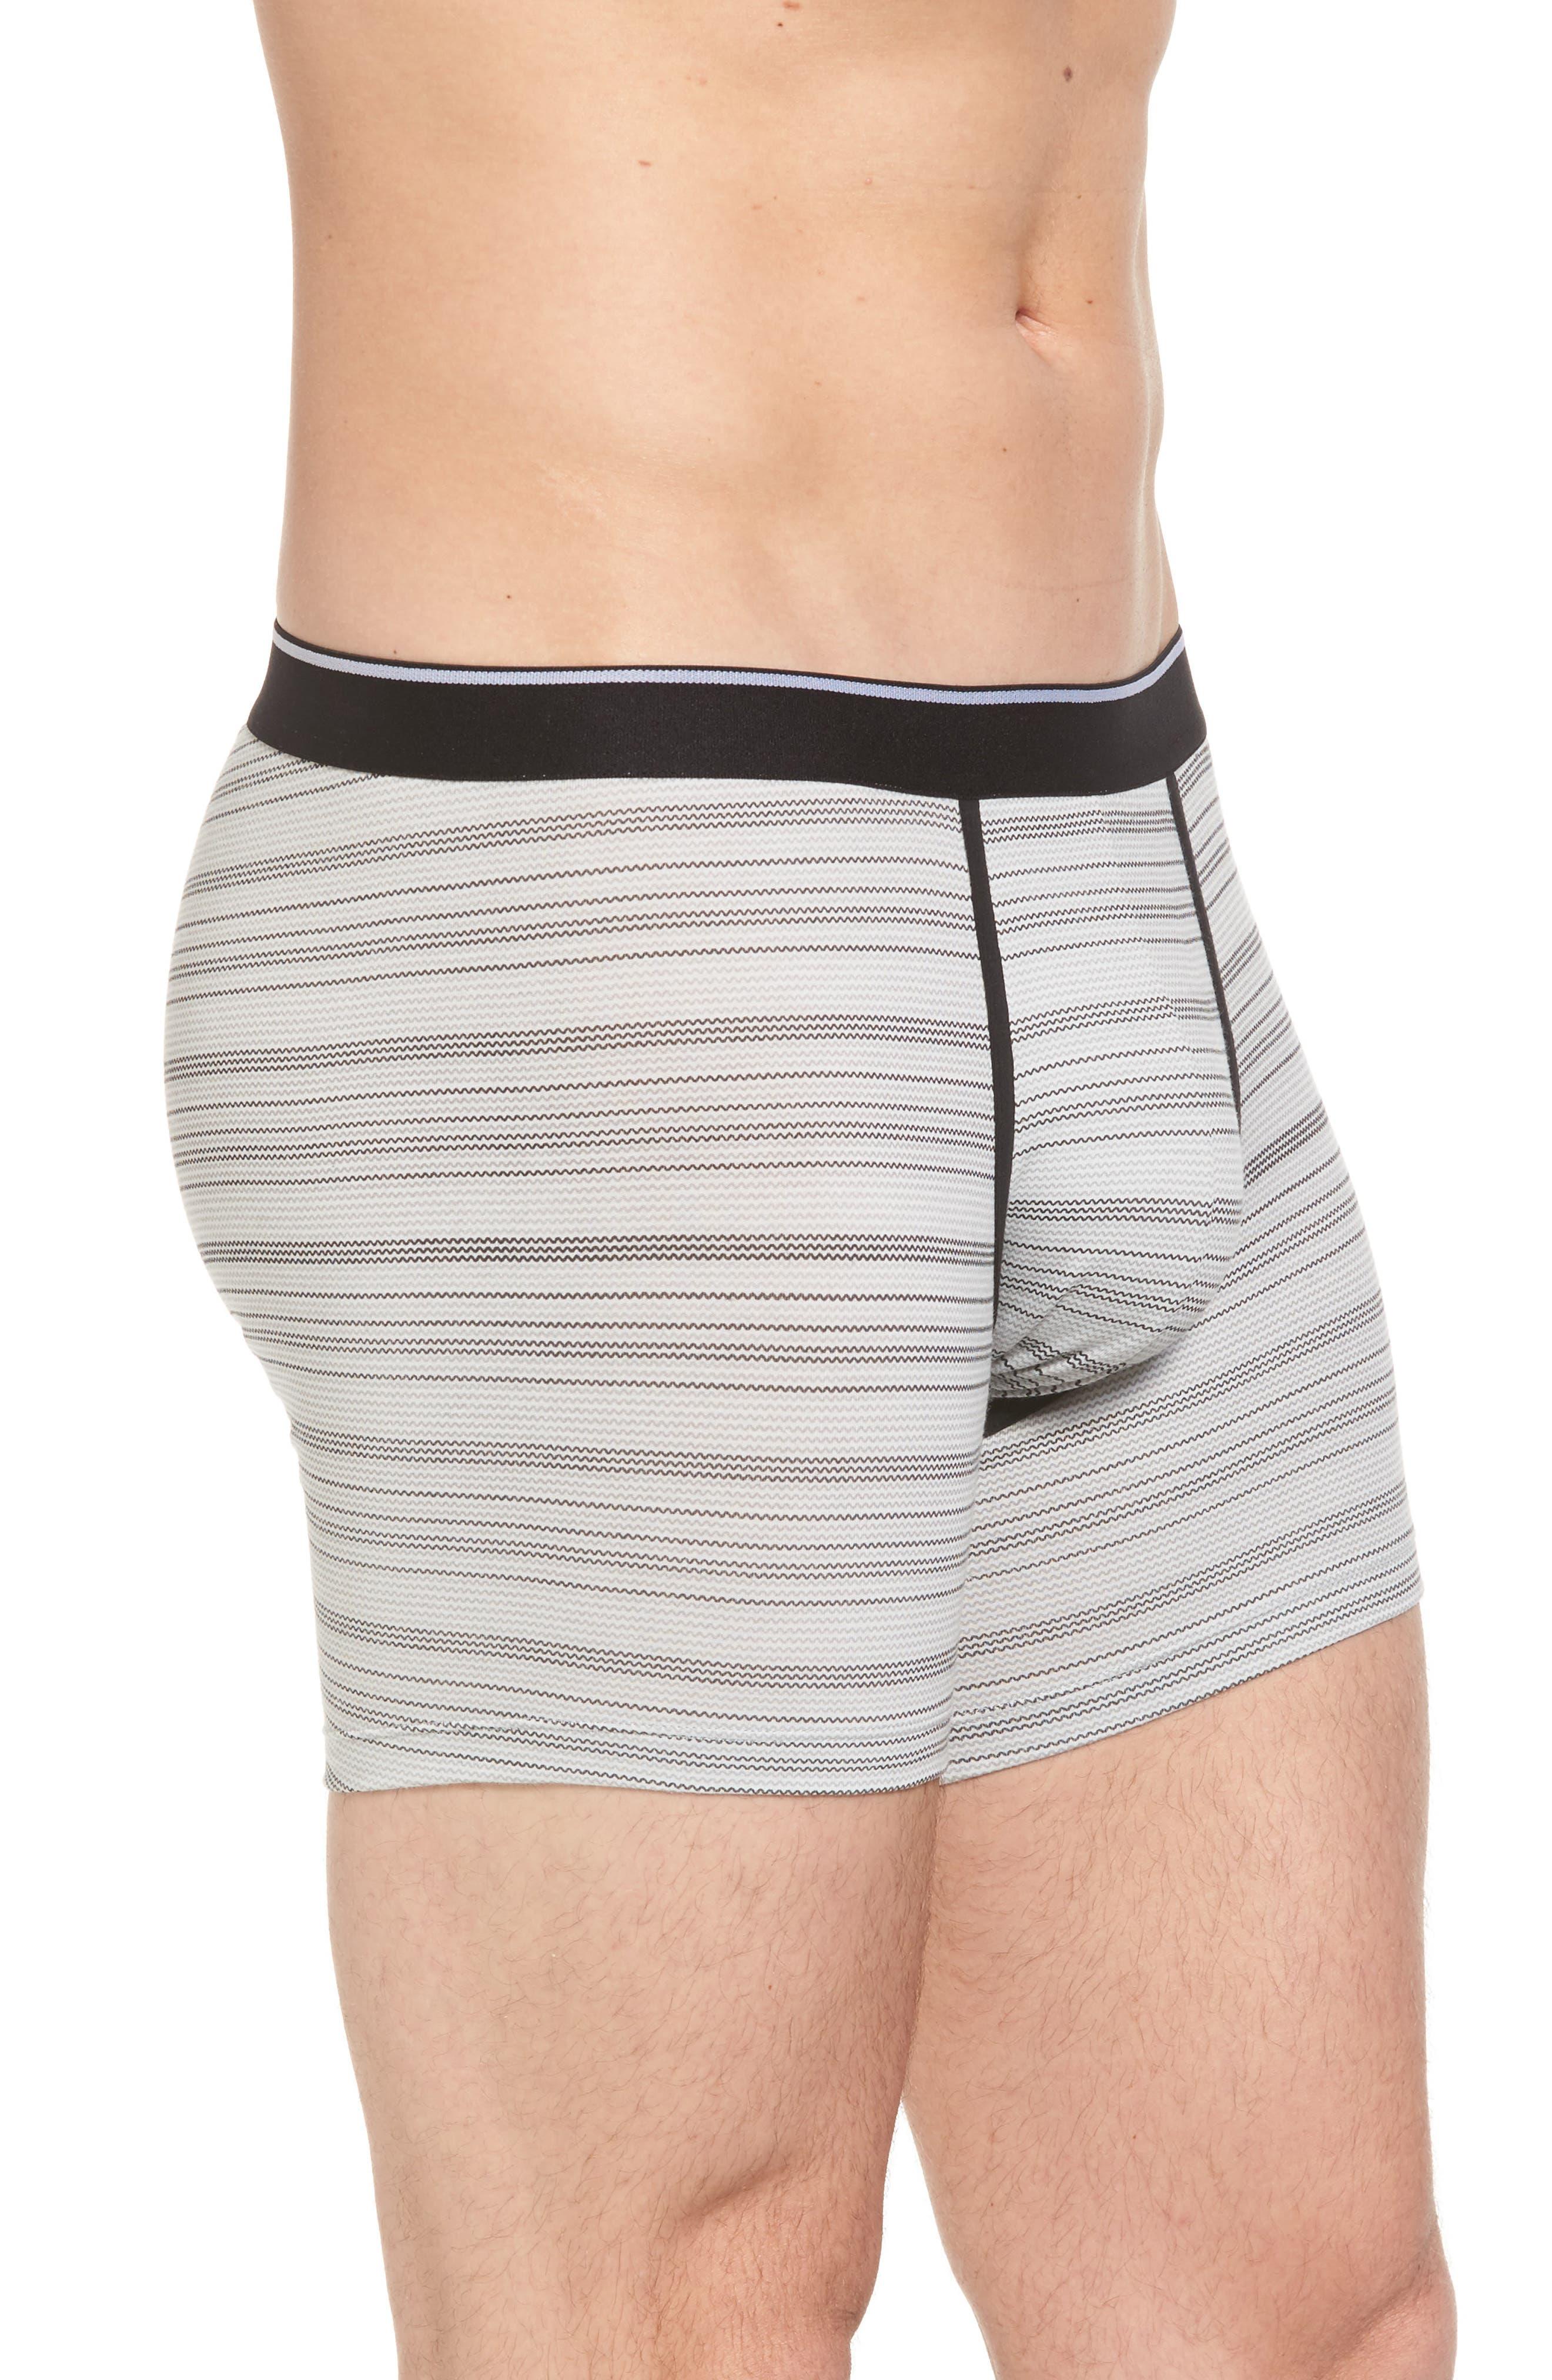 Boxer Briefs,                             Alternate thumbnail 3, color,                             Grey- Black Zig Zag Stripe